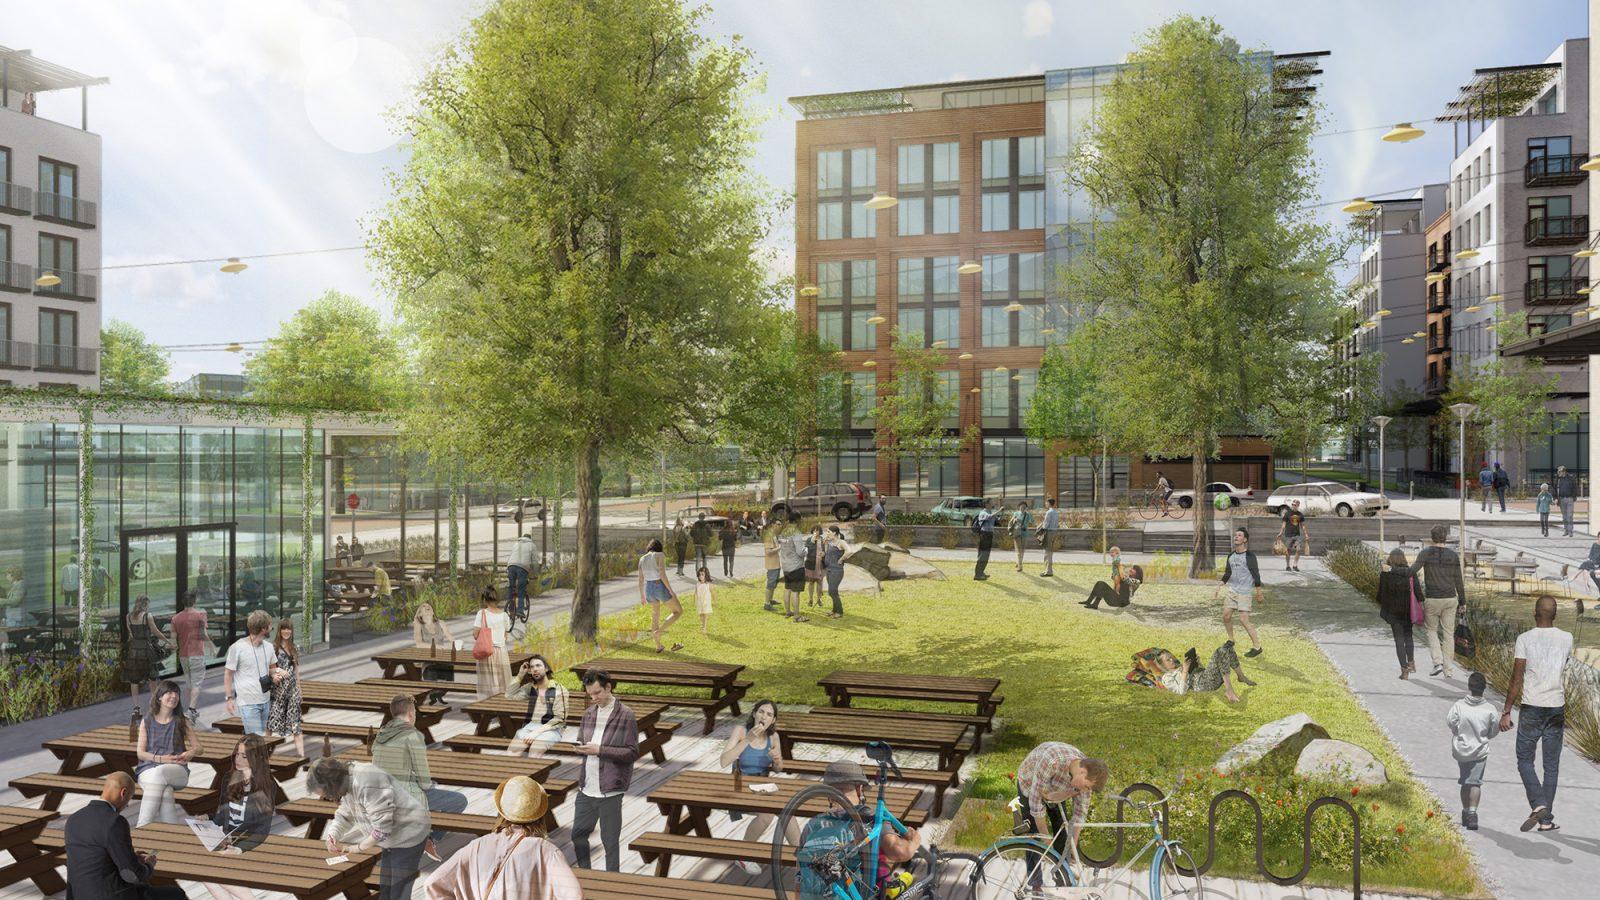 Baseline Community: Courtyard Rendering